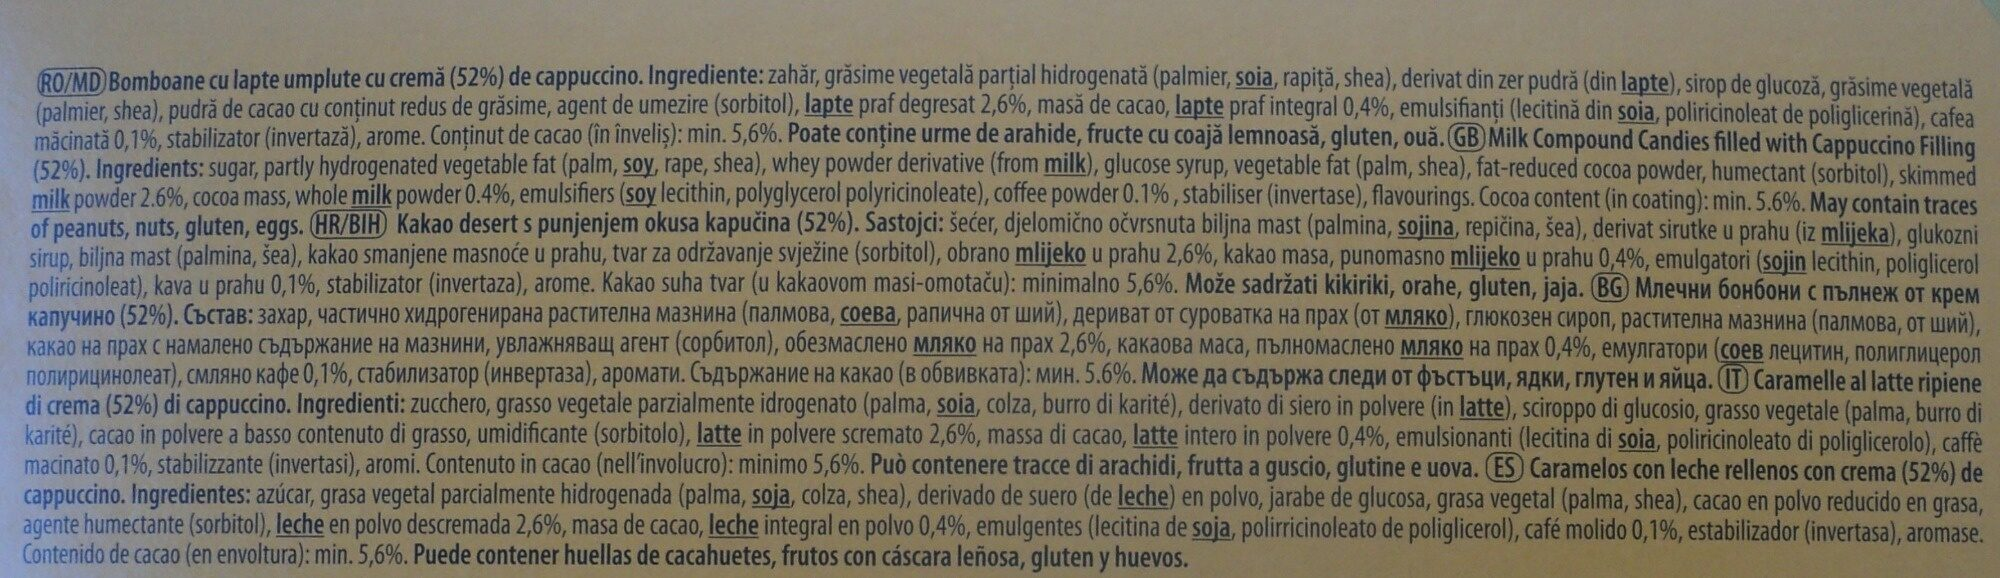 Bomboane cu cremă cappuccino - Ingredientes - es